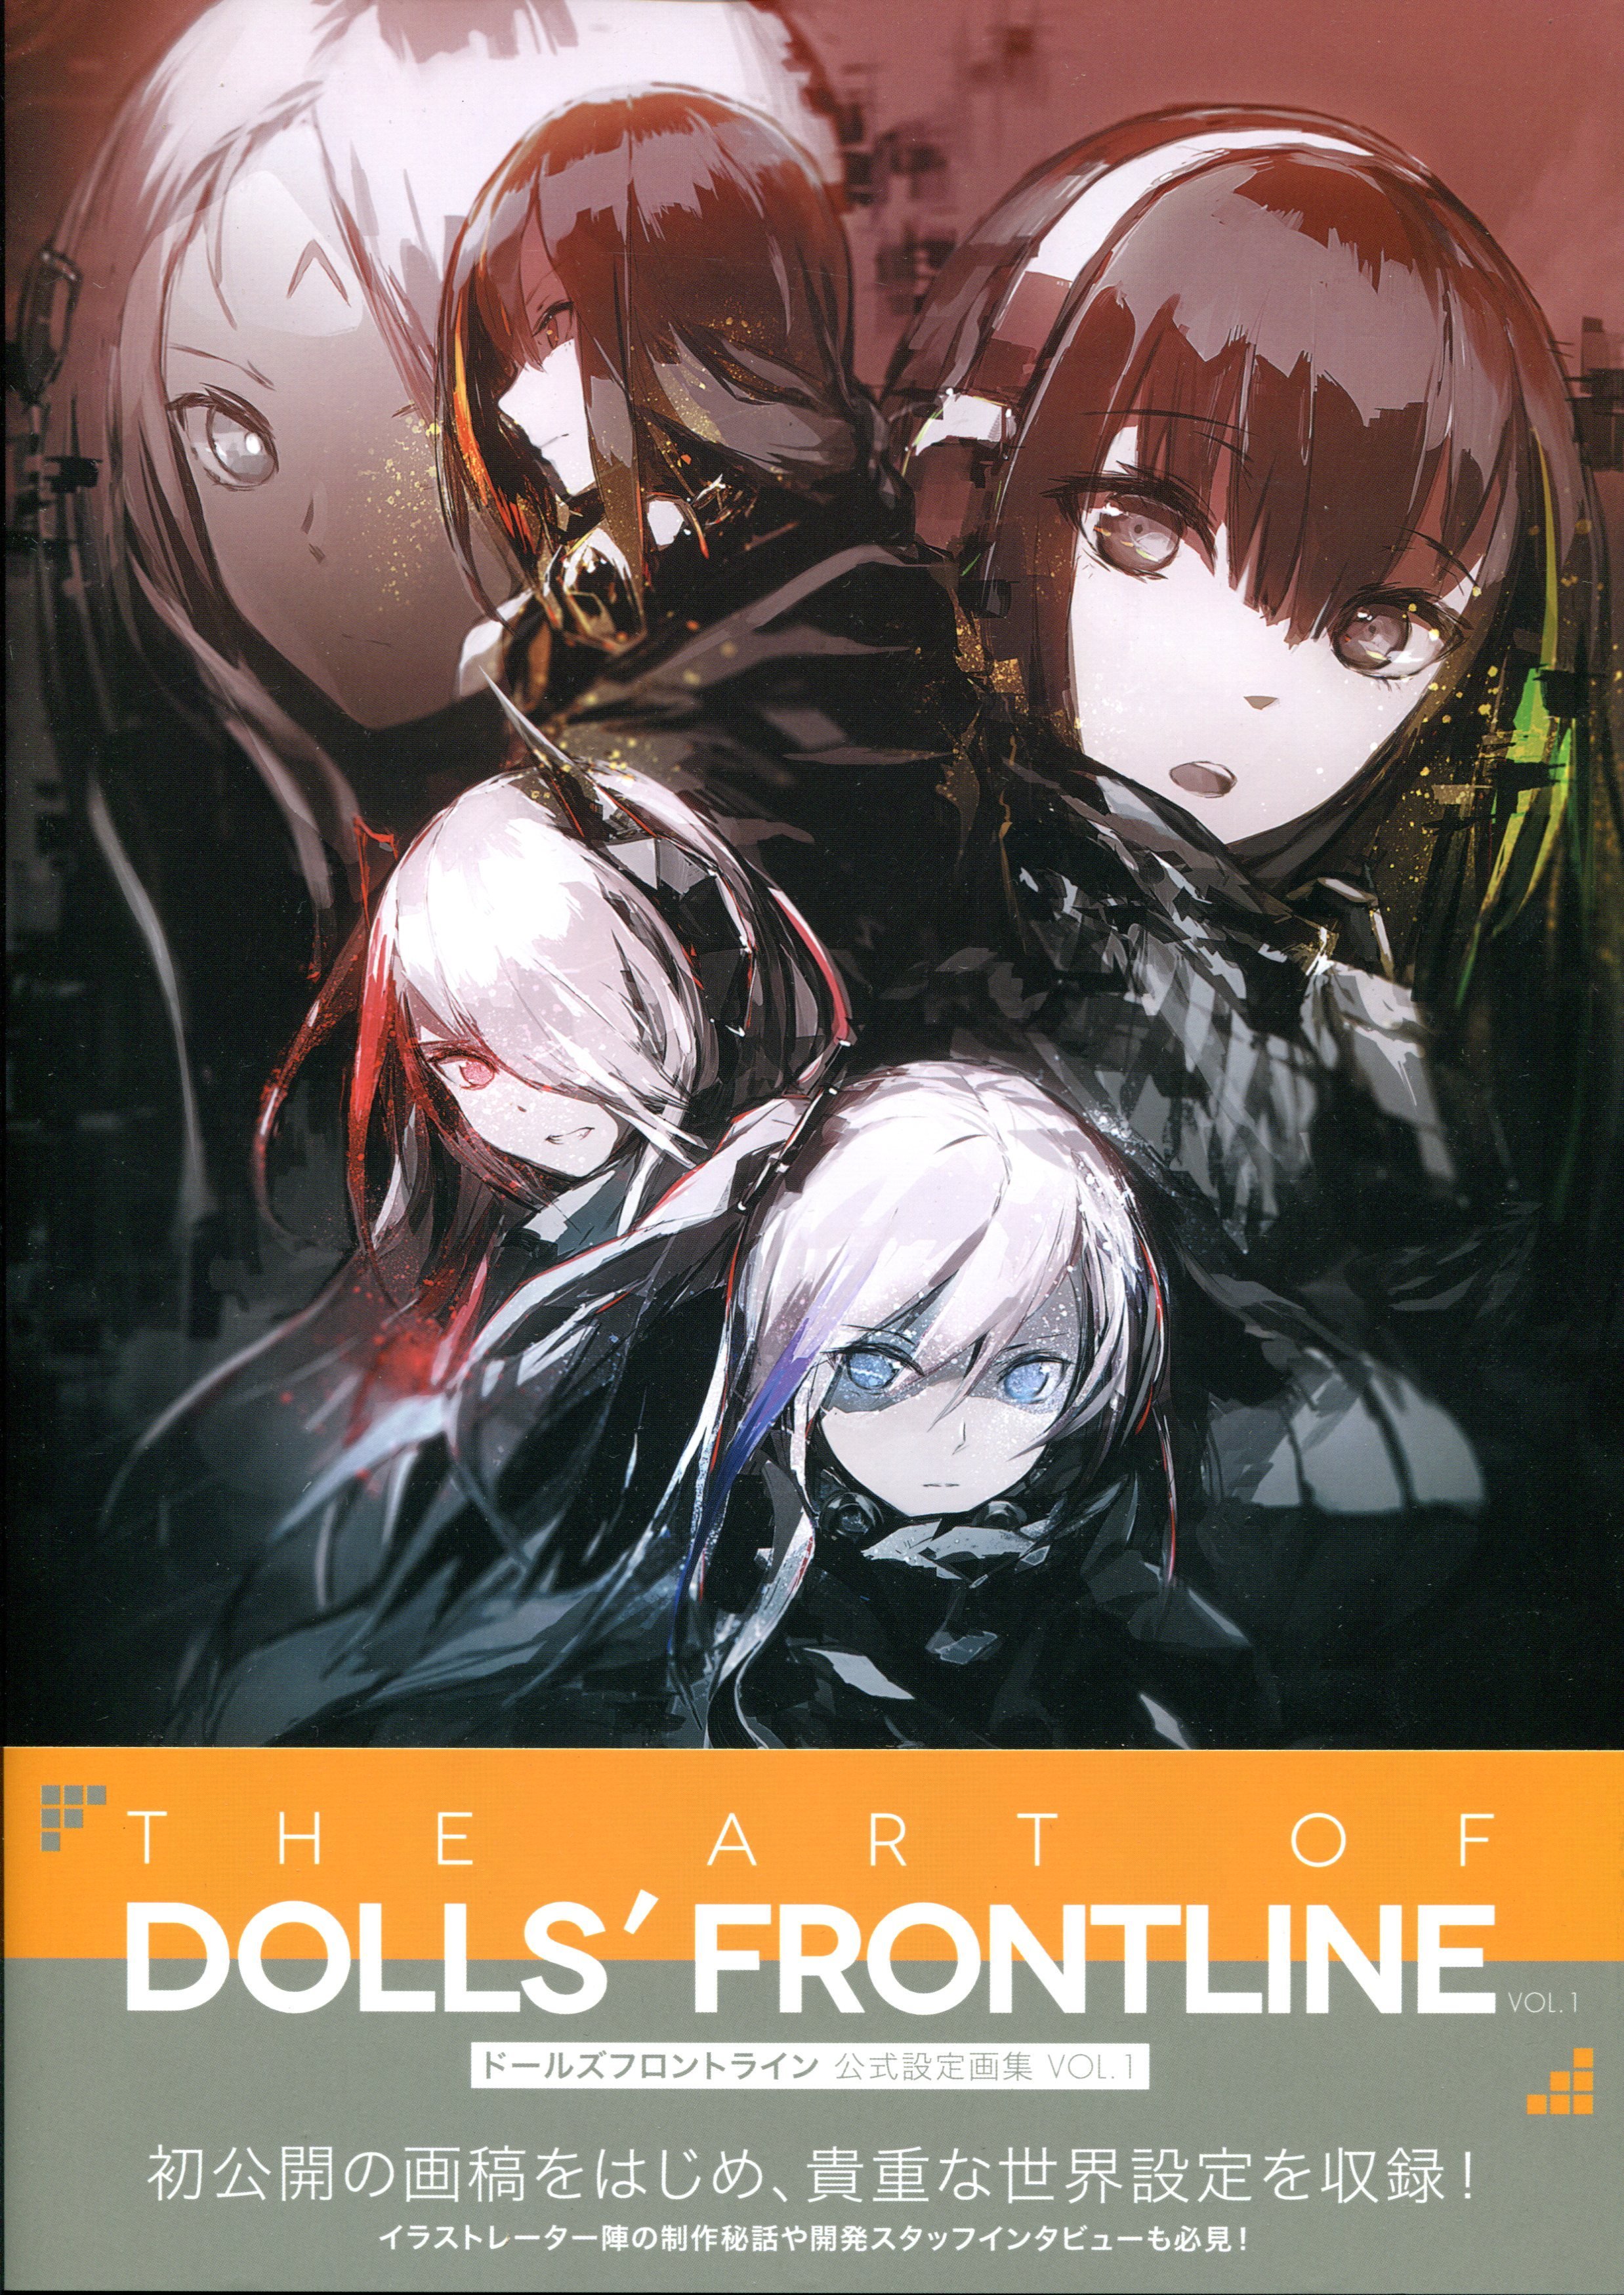 少女前線 DOLLS FRONT LINE 公式設定畫集 Vol.1